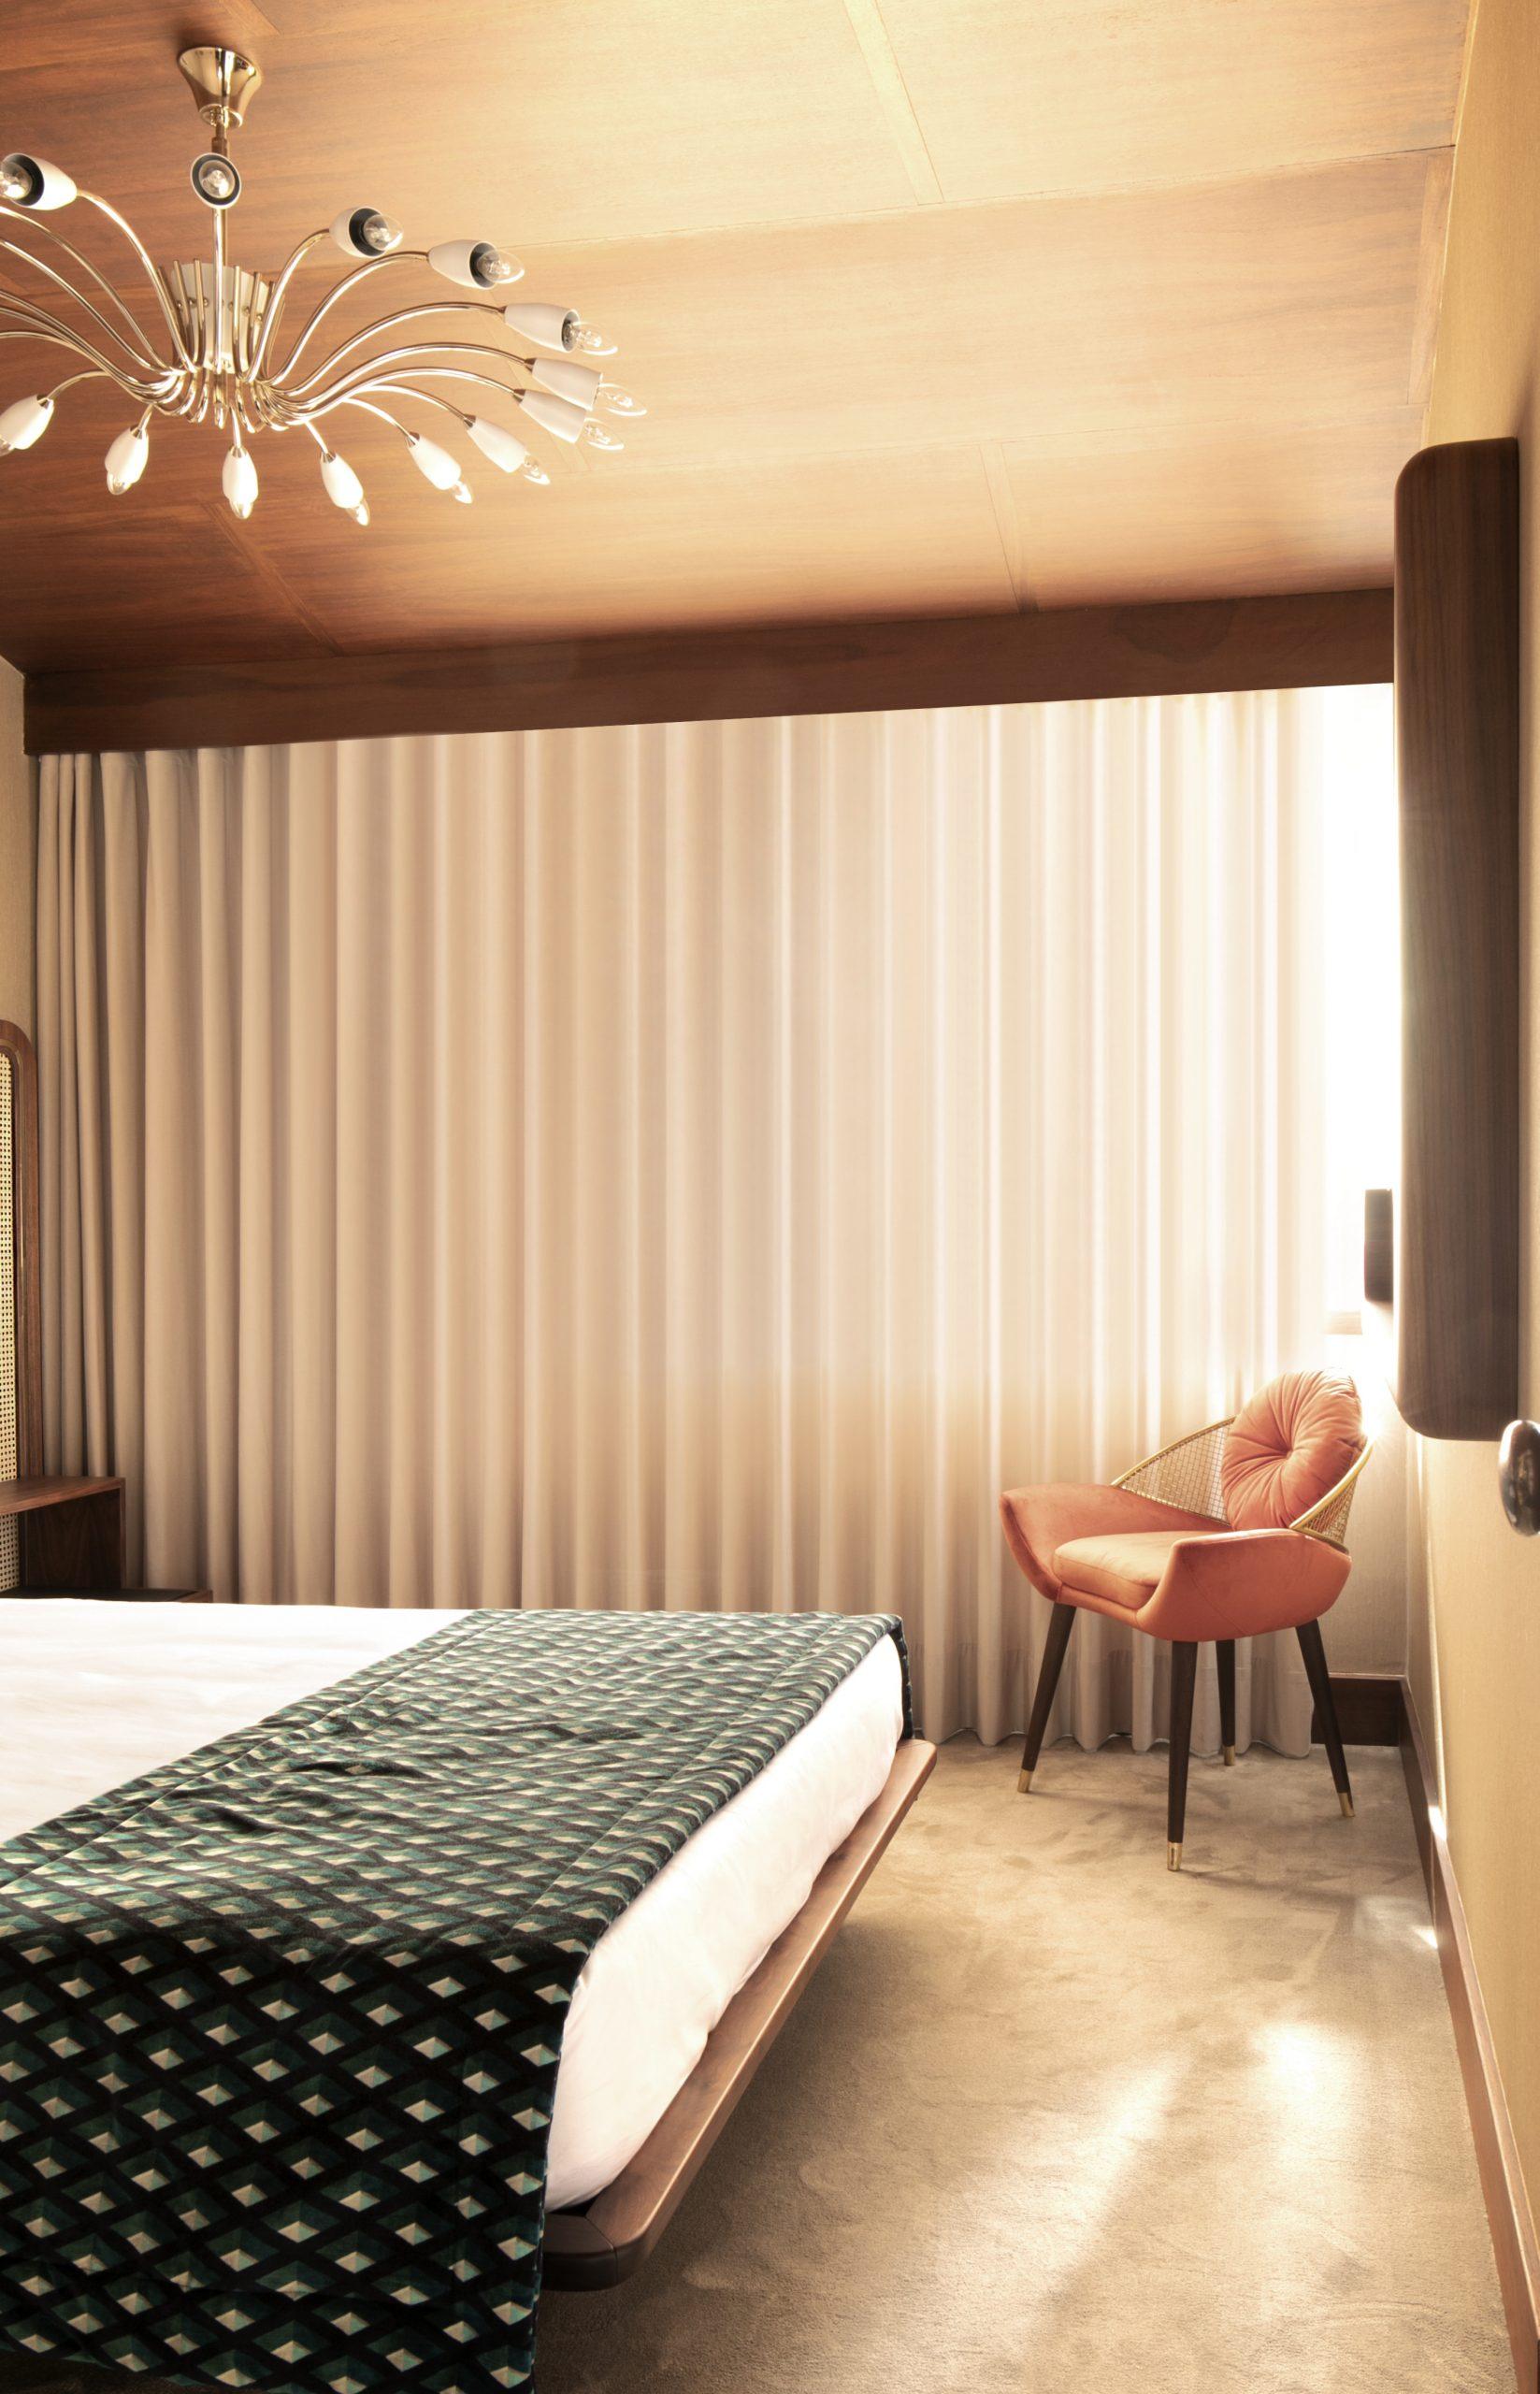 Unique Bedroom Design Ideas That Will Inspire You